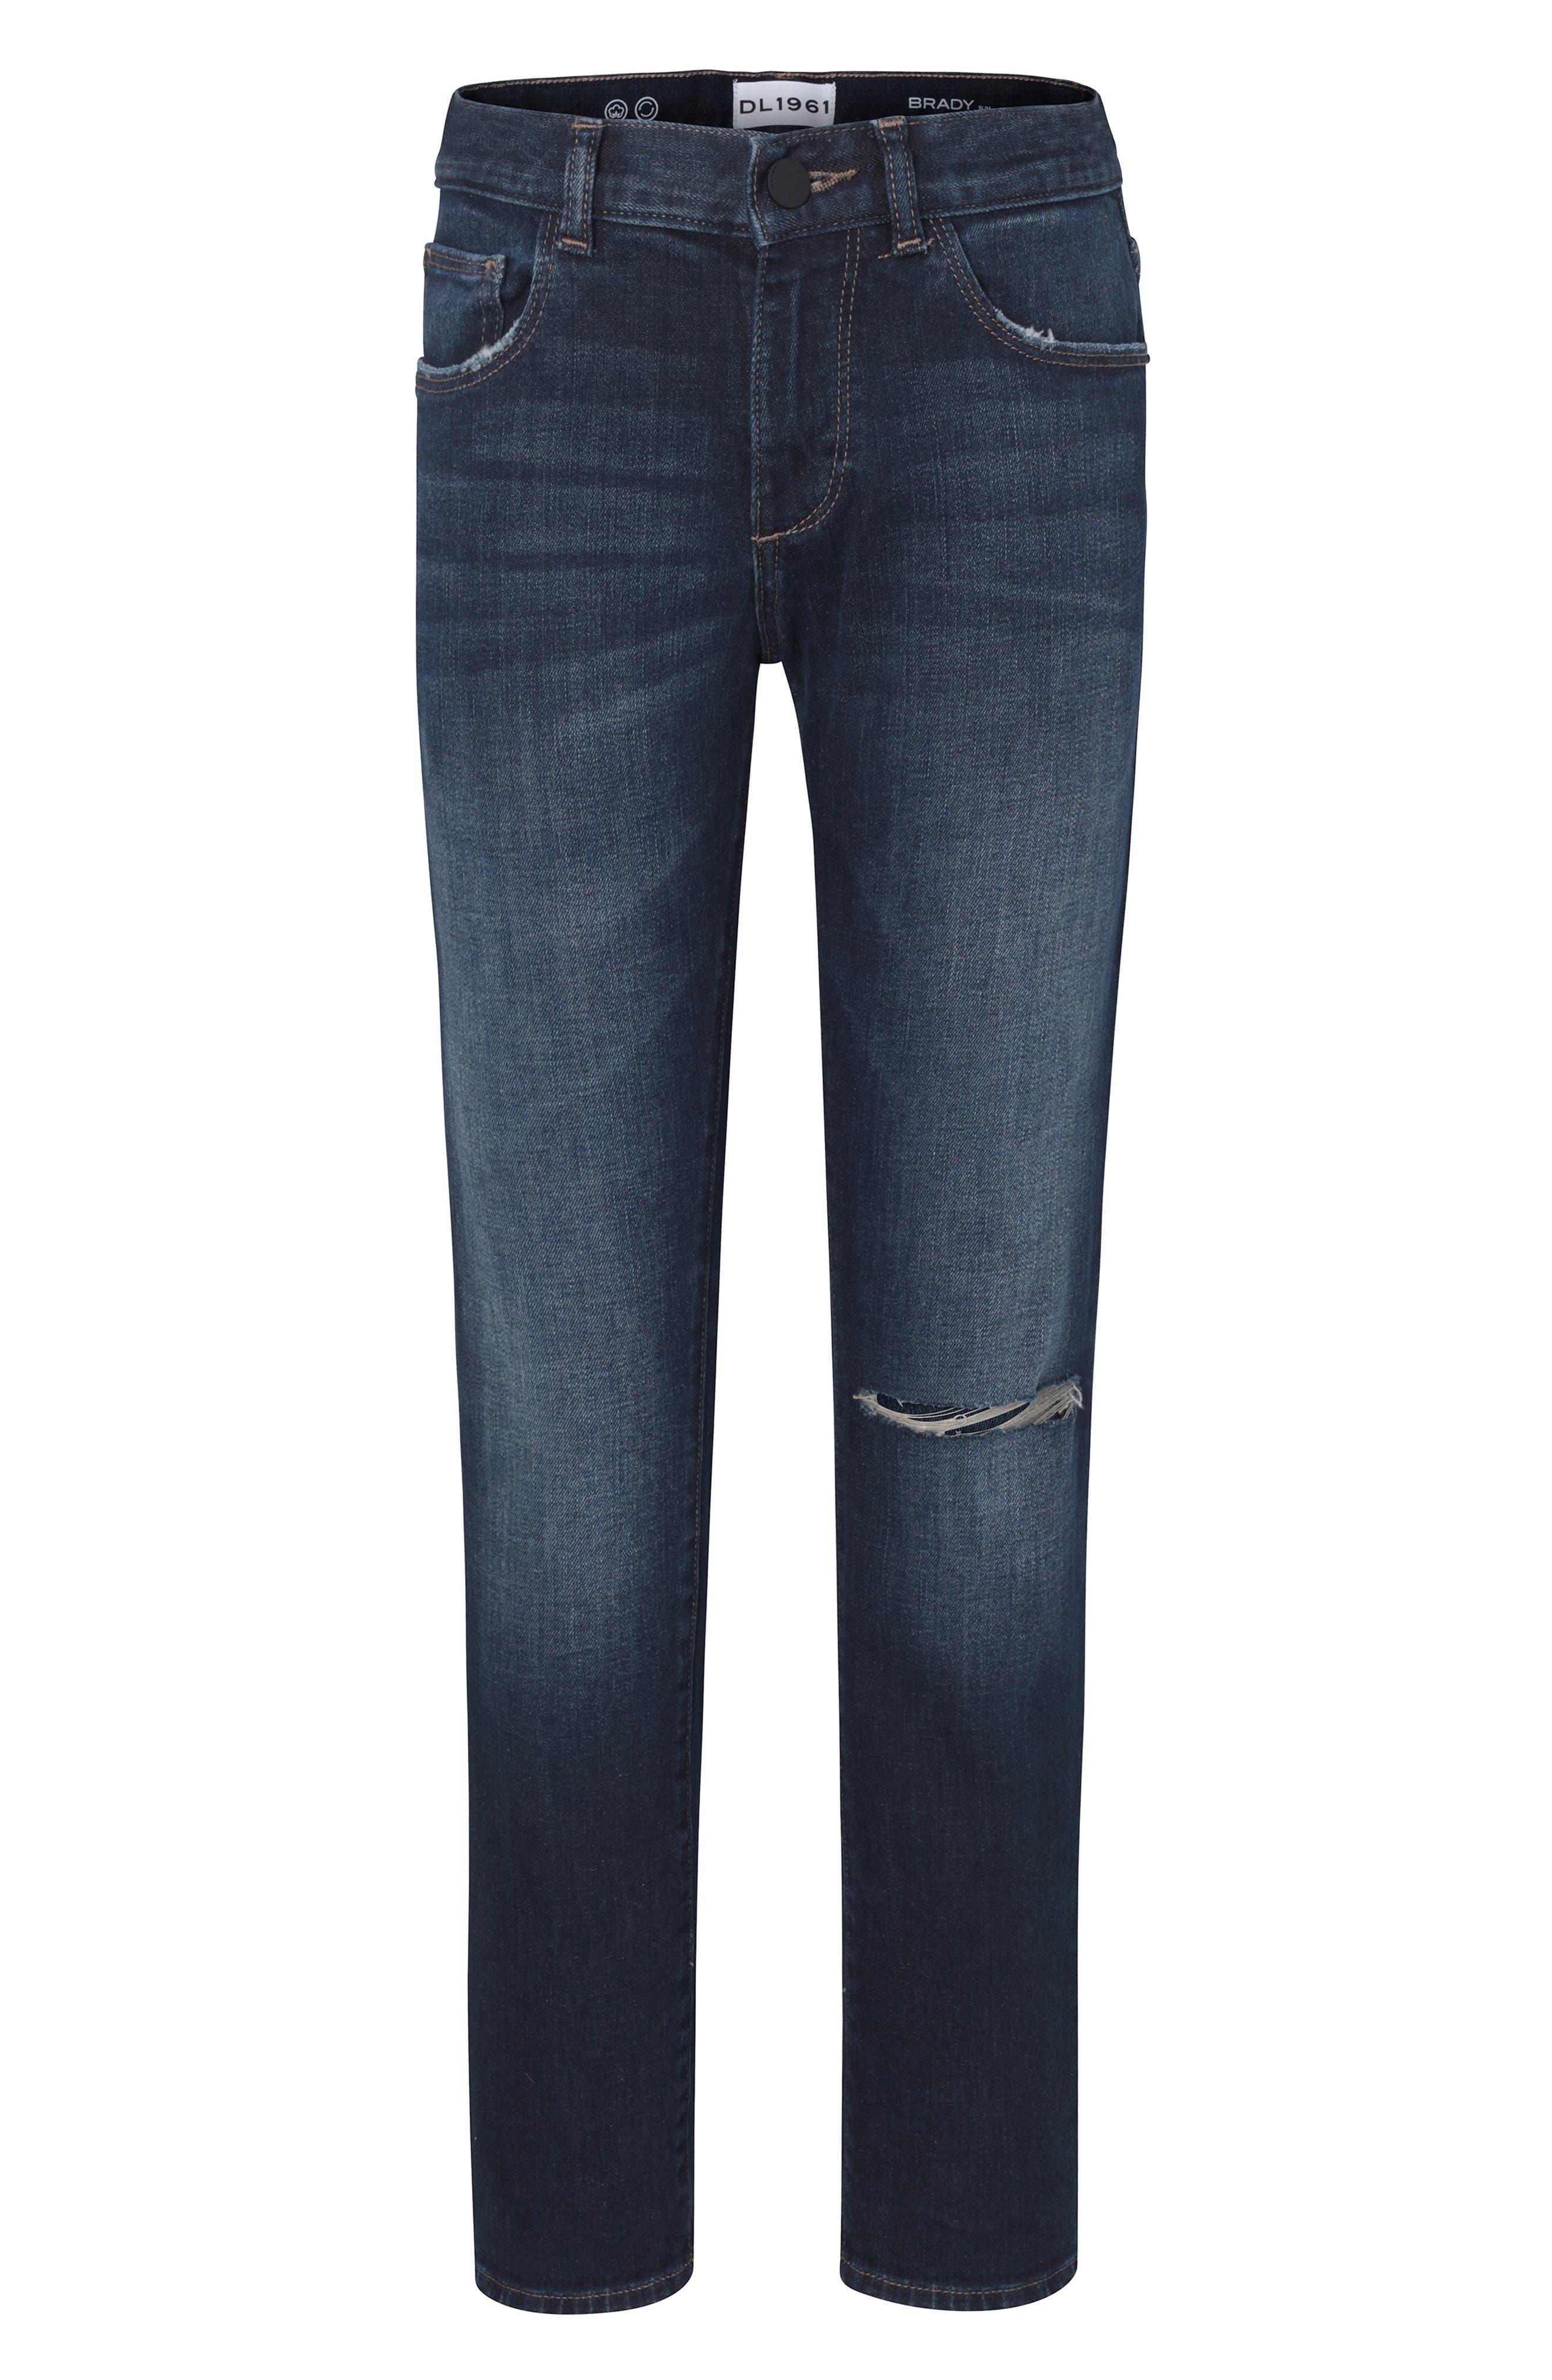 Brady Distressed Slim Fit Jeans,                             Main thumbnail 1, color,                             BLUE